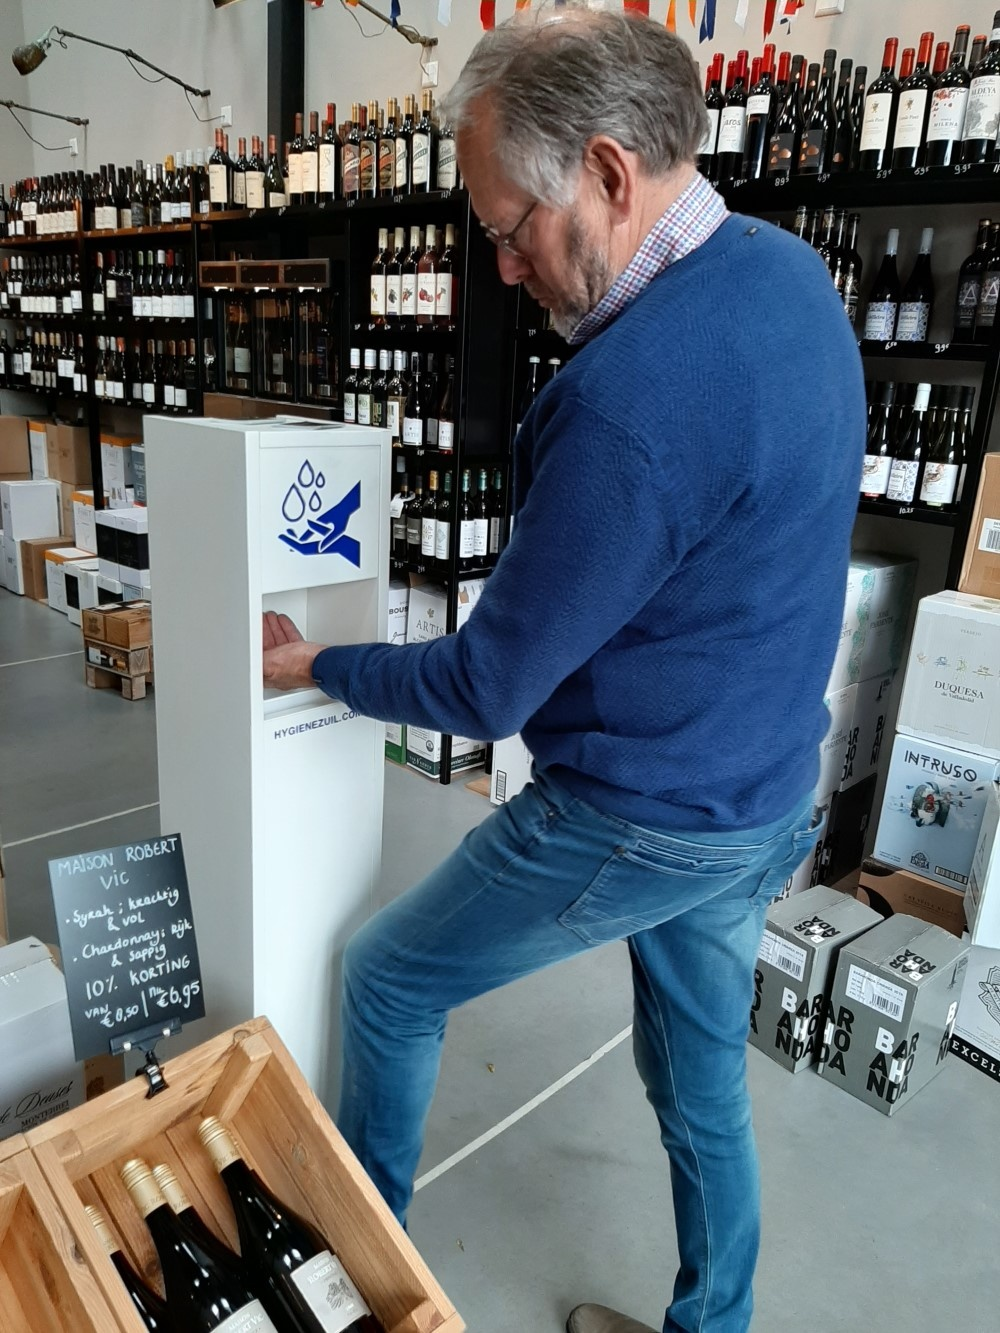 Hygienezuil in Wijnwinkel Barneveld